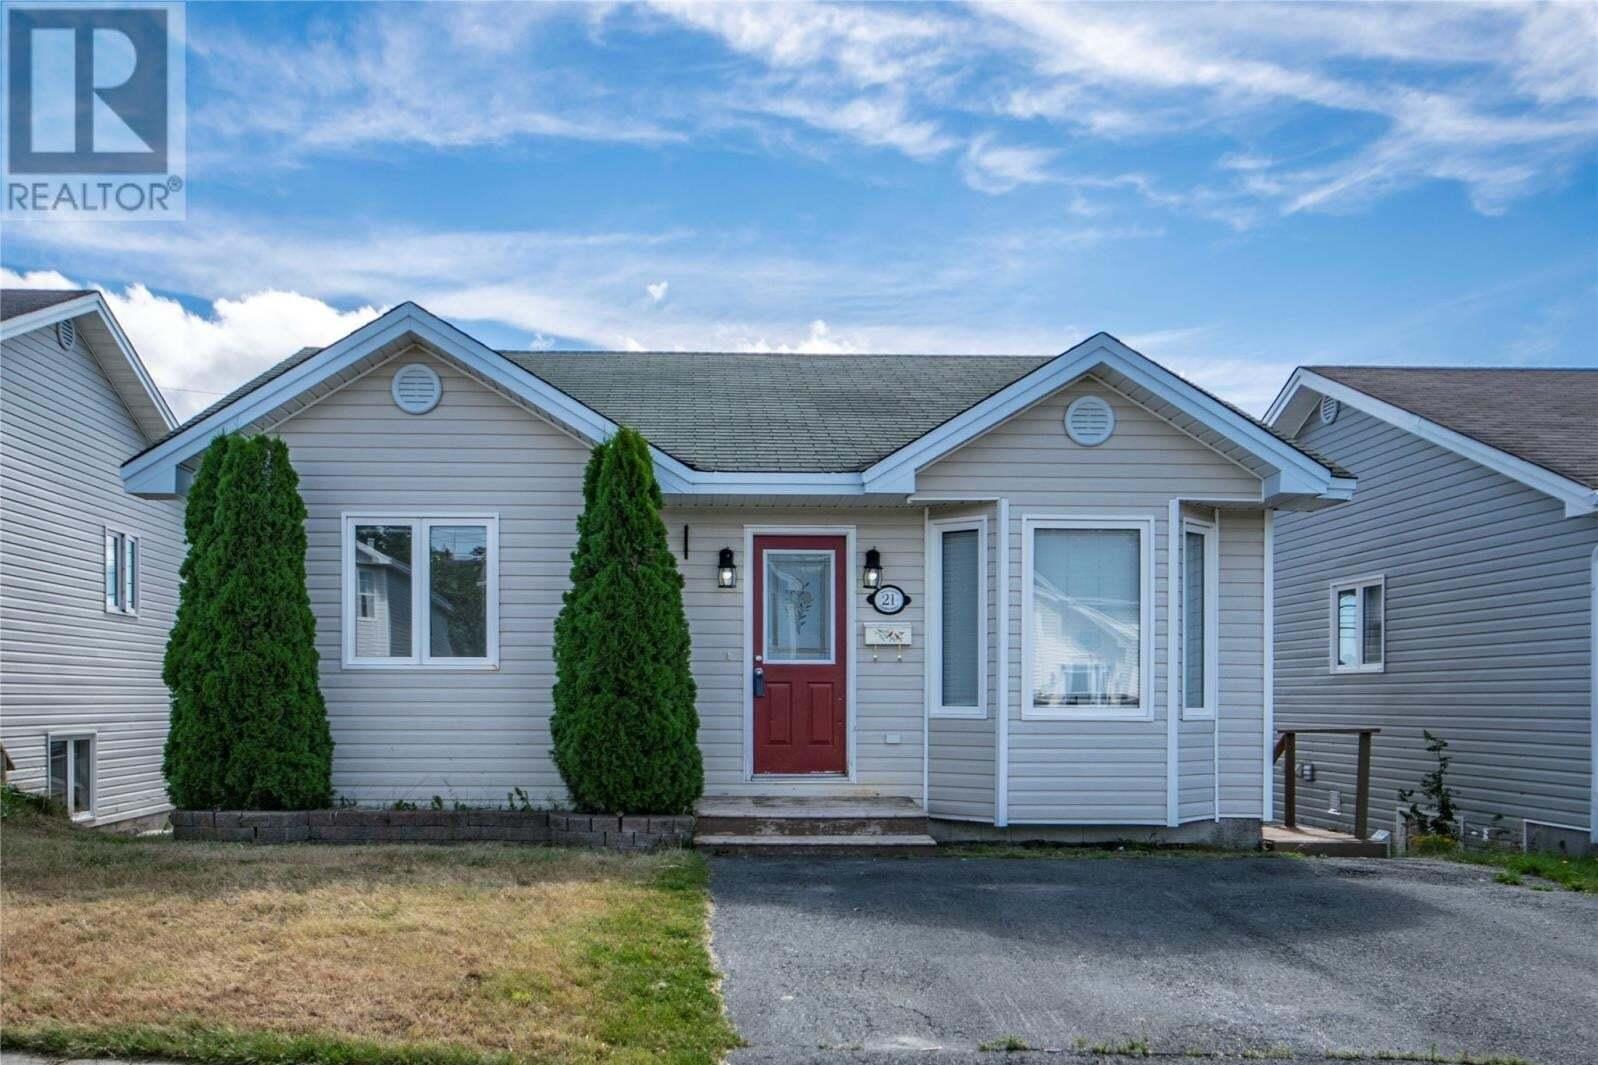 House for sale at 21 Kelland Cres St. John's Newfoundland - MLS: 1221039